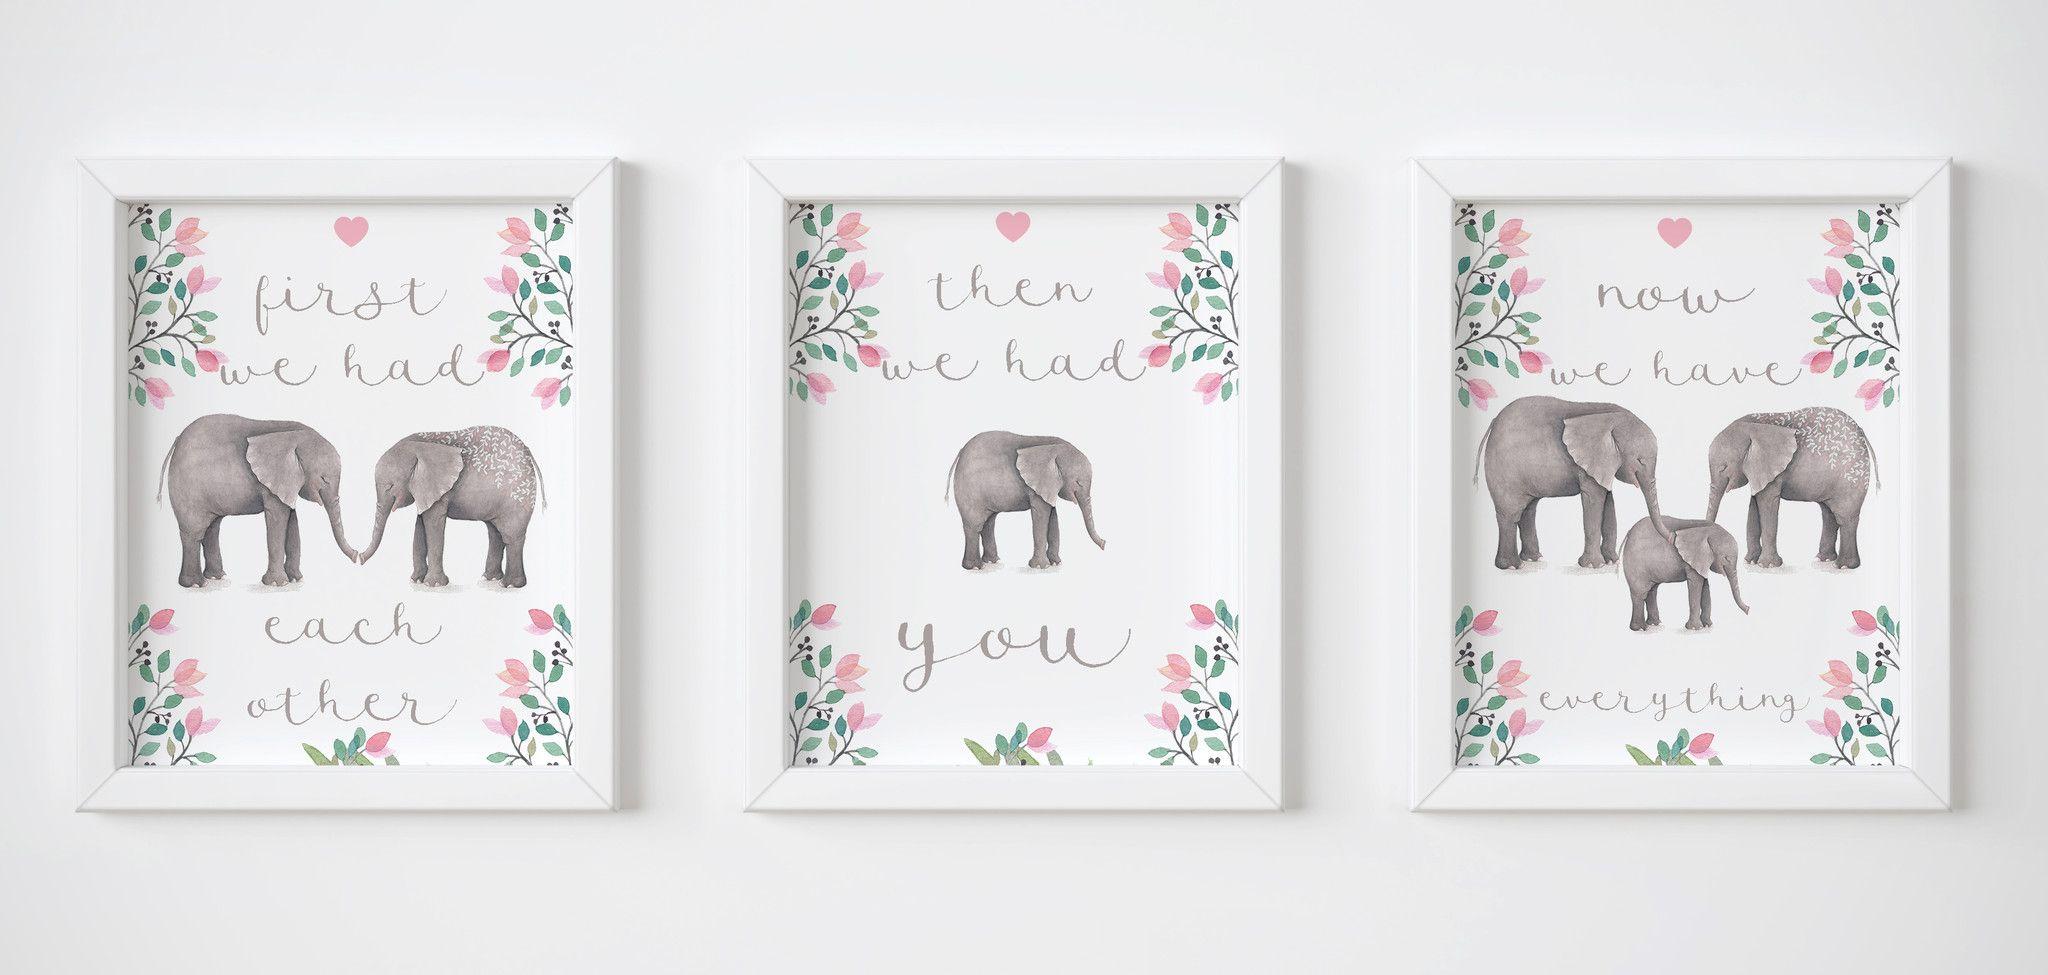 Each Other Trio Elephants